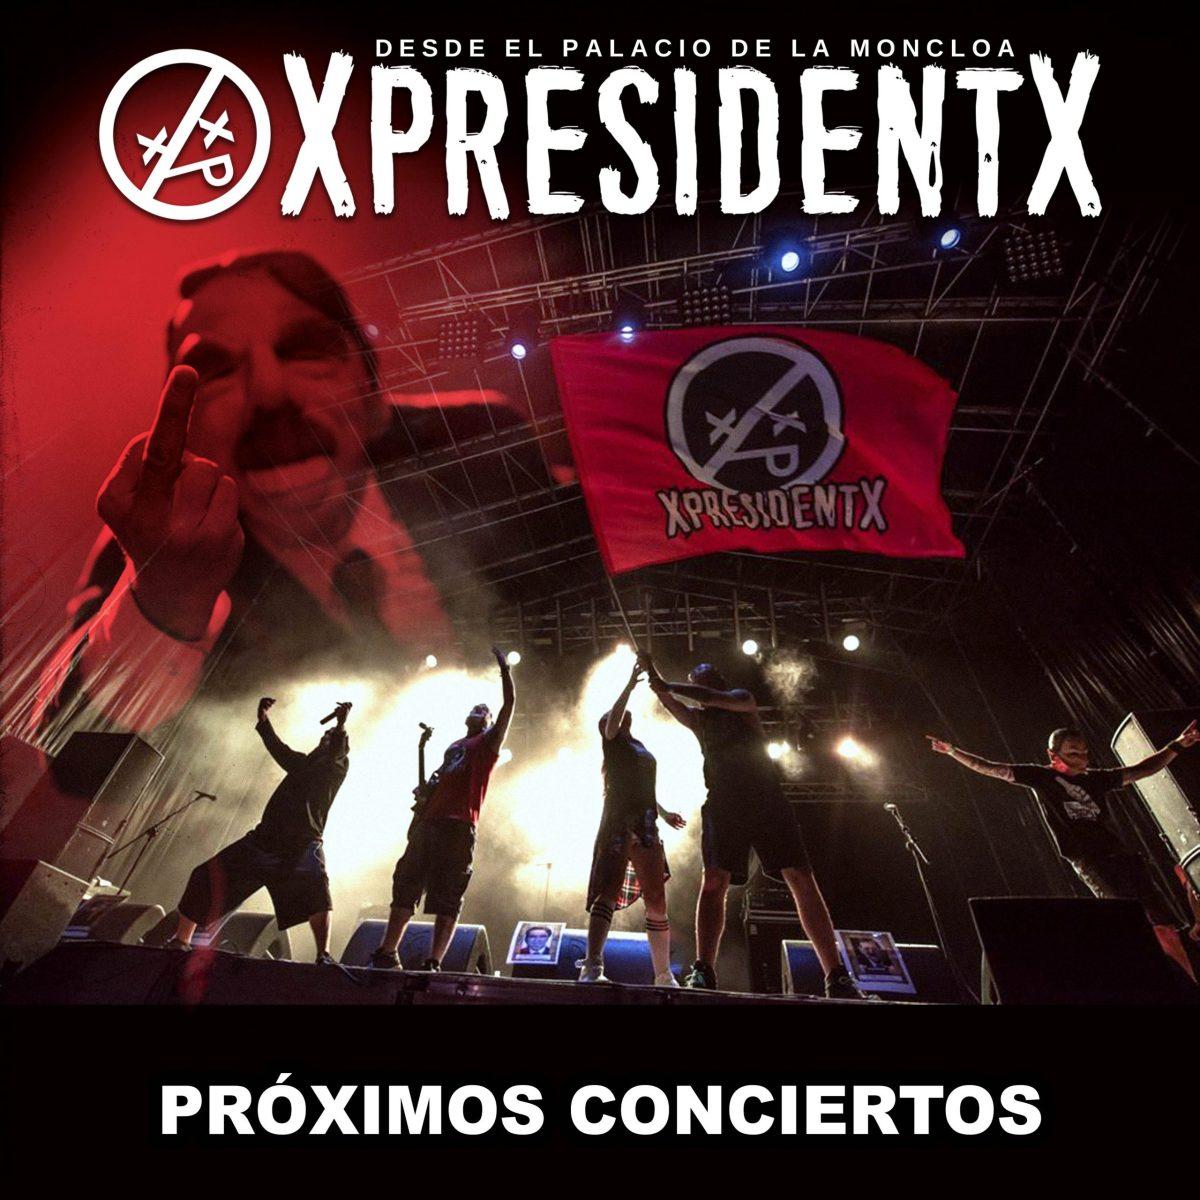 XpresidentX proximos conciertos rap metal punk rapmetal